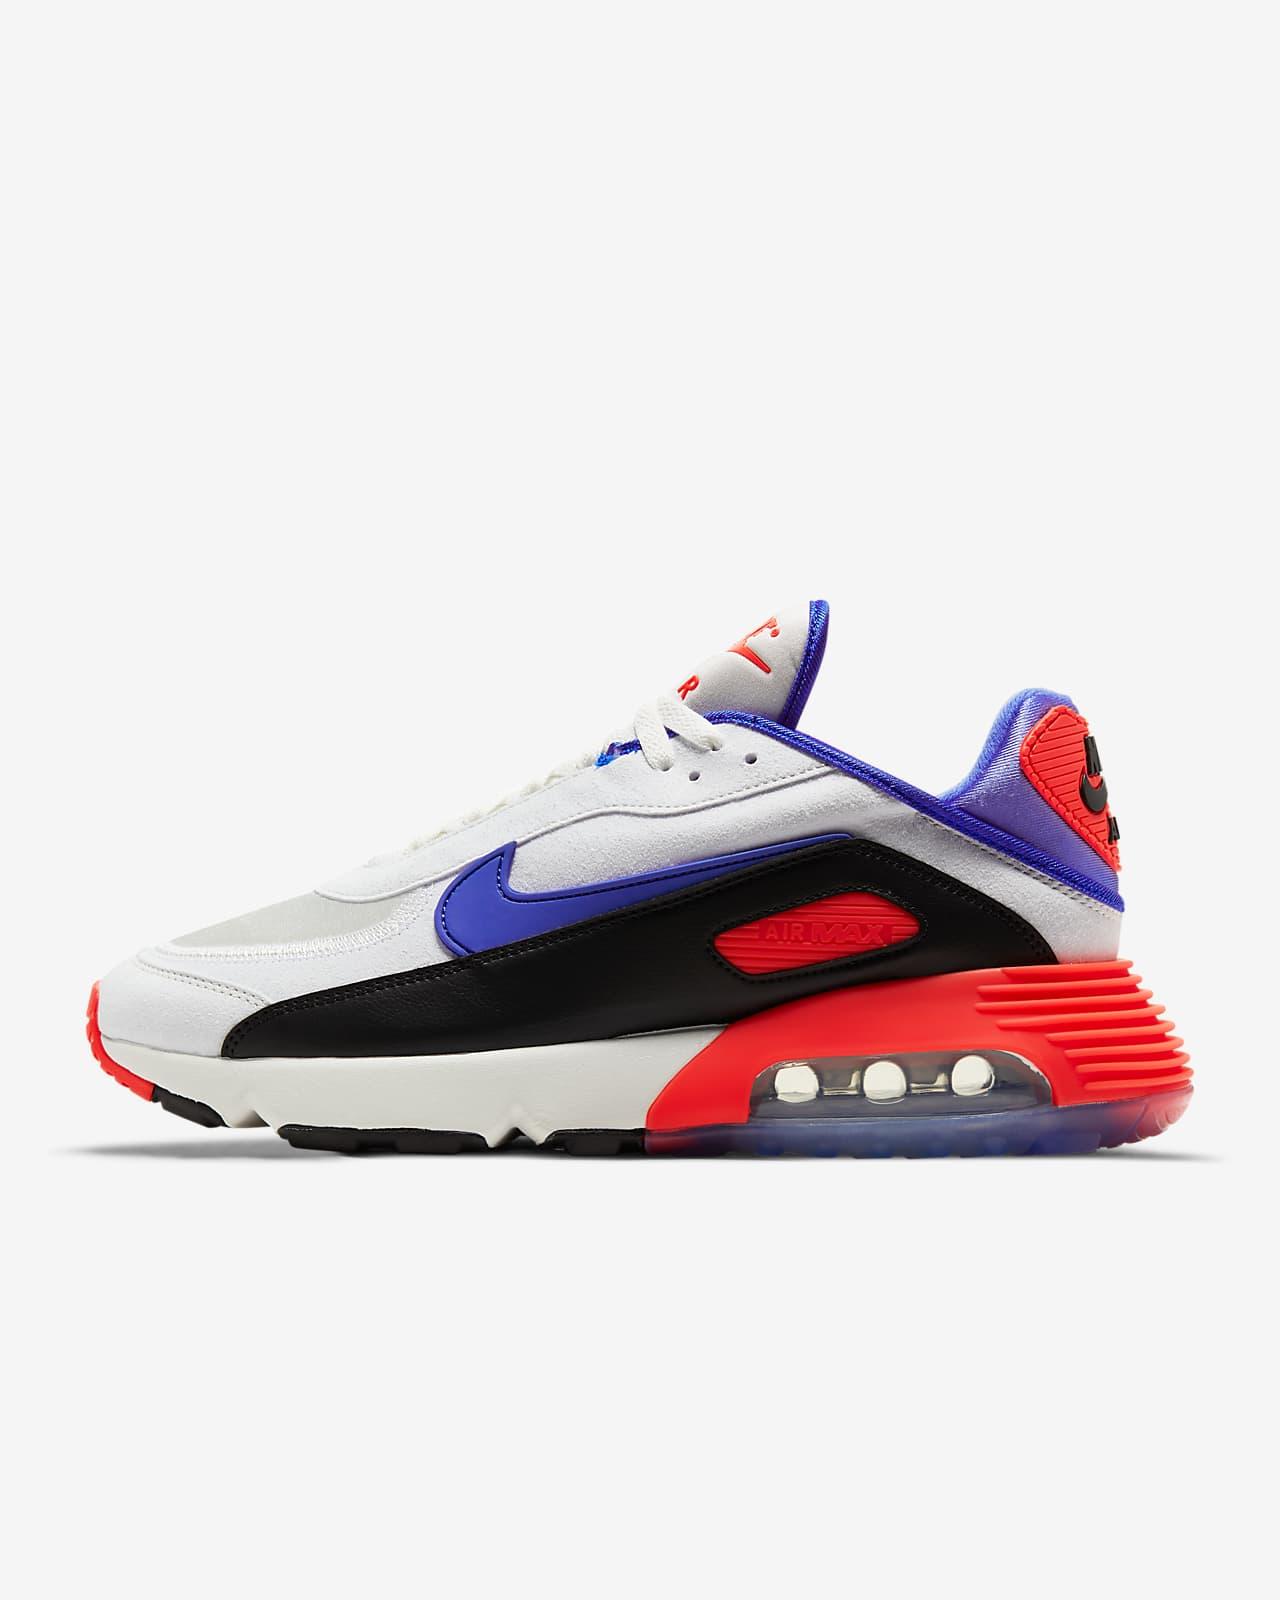 Nike Air Max 2090 EOI Men's Shoes